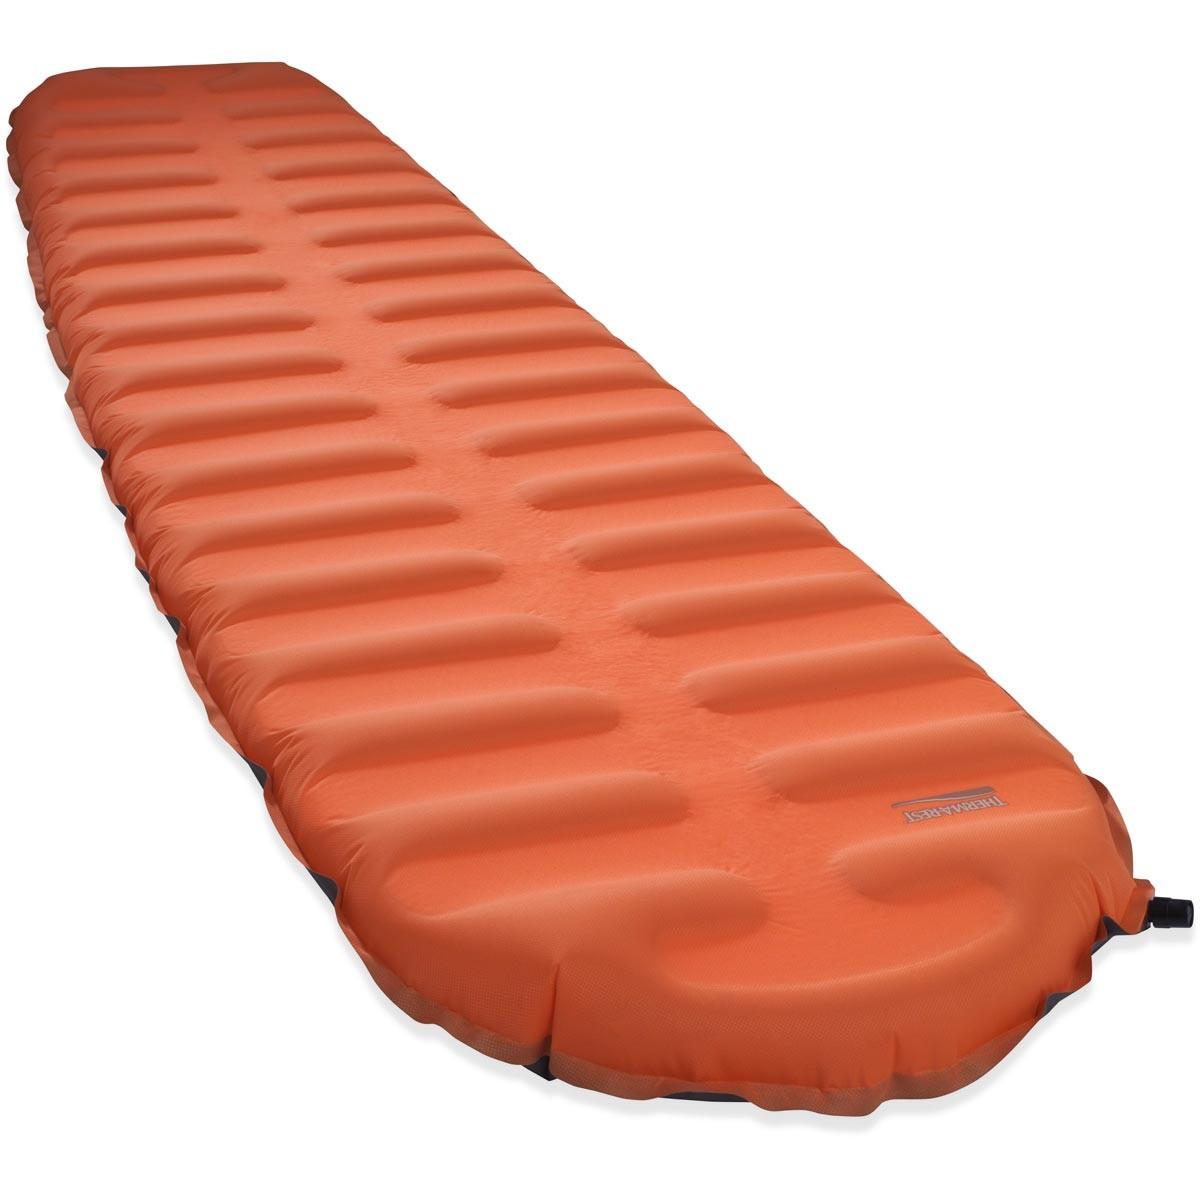 Therm-a-rest Evolite Plus L, colchoneta autohinchable con estructura de espuma